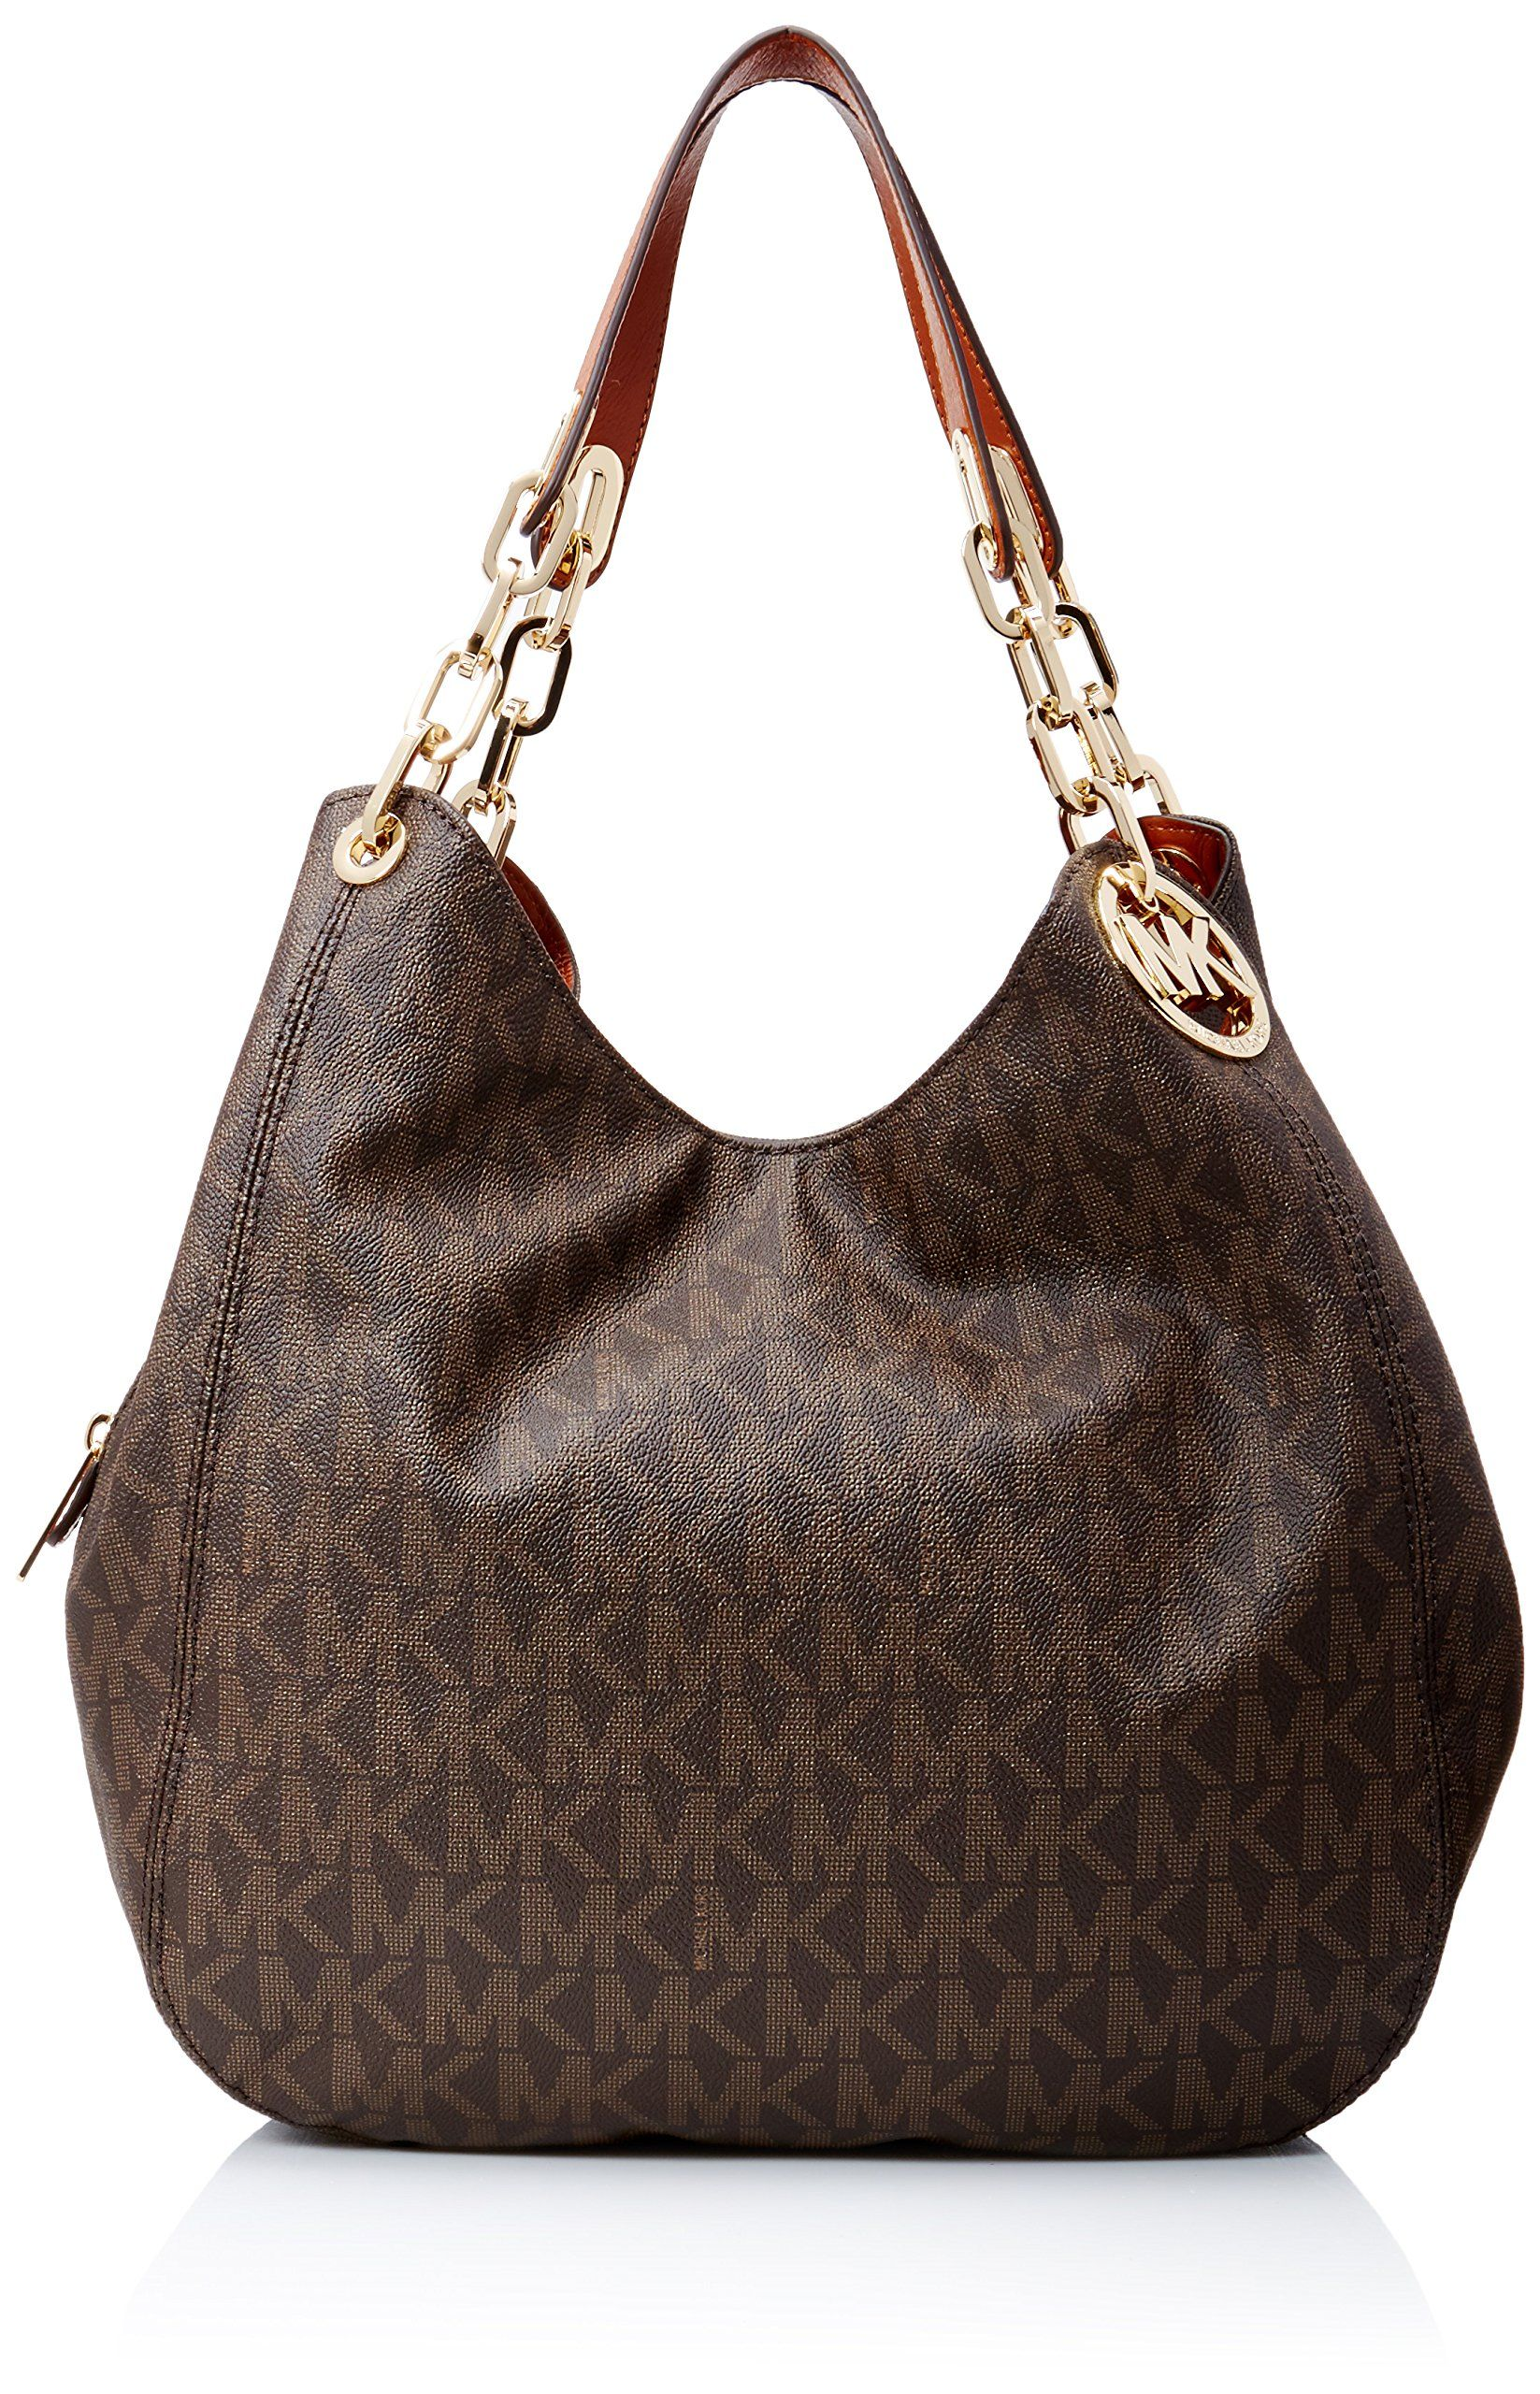 008b1f621e486 Michael Kors Fulton Large Leather Shoulder Bag